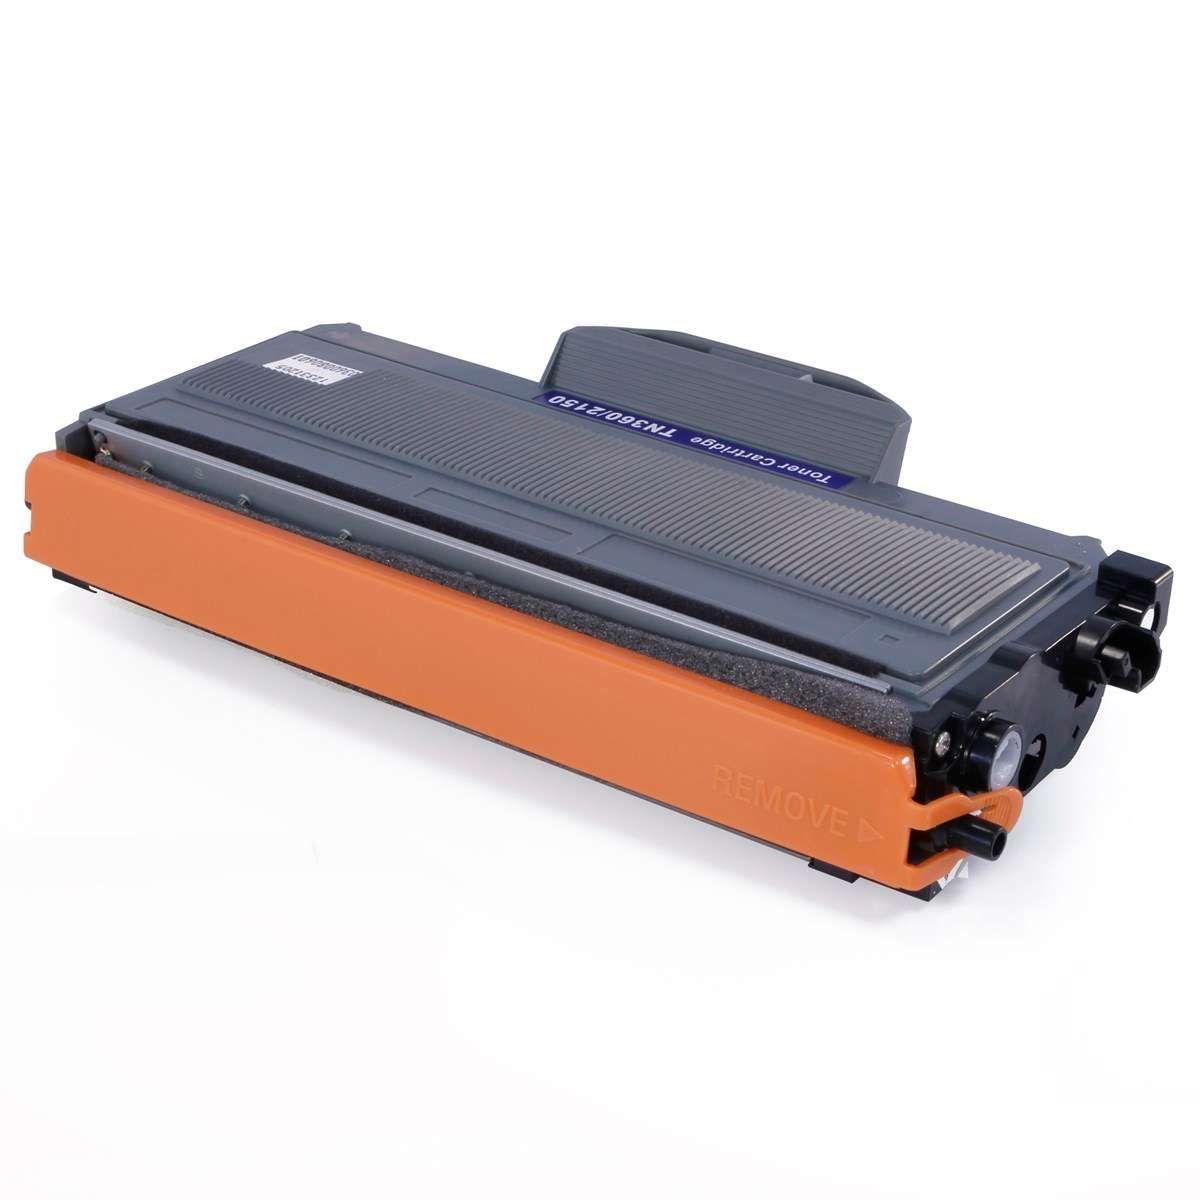 Toner Brother TN360 - 2.6K Compativel